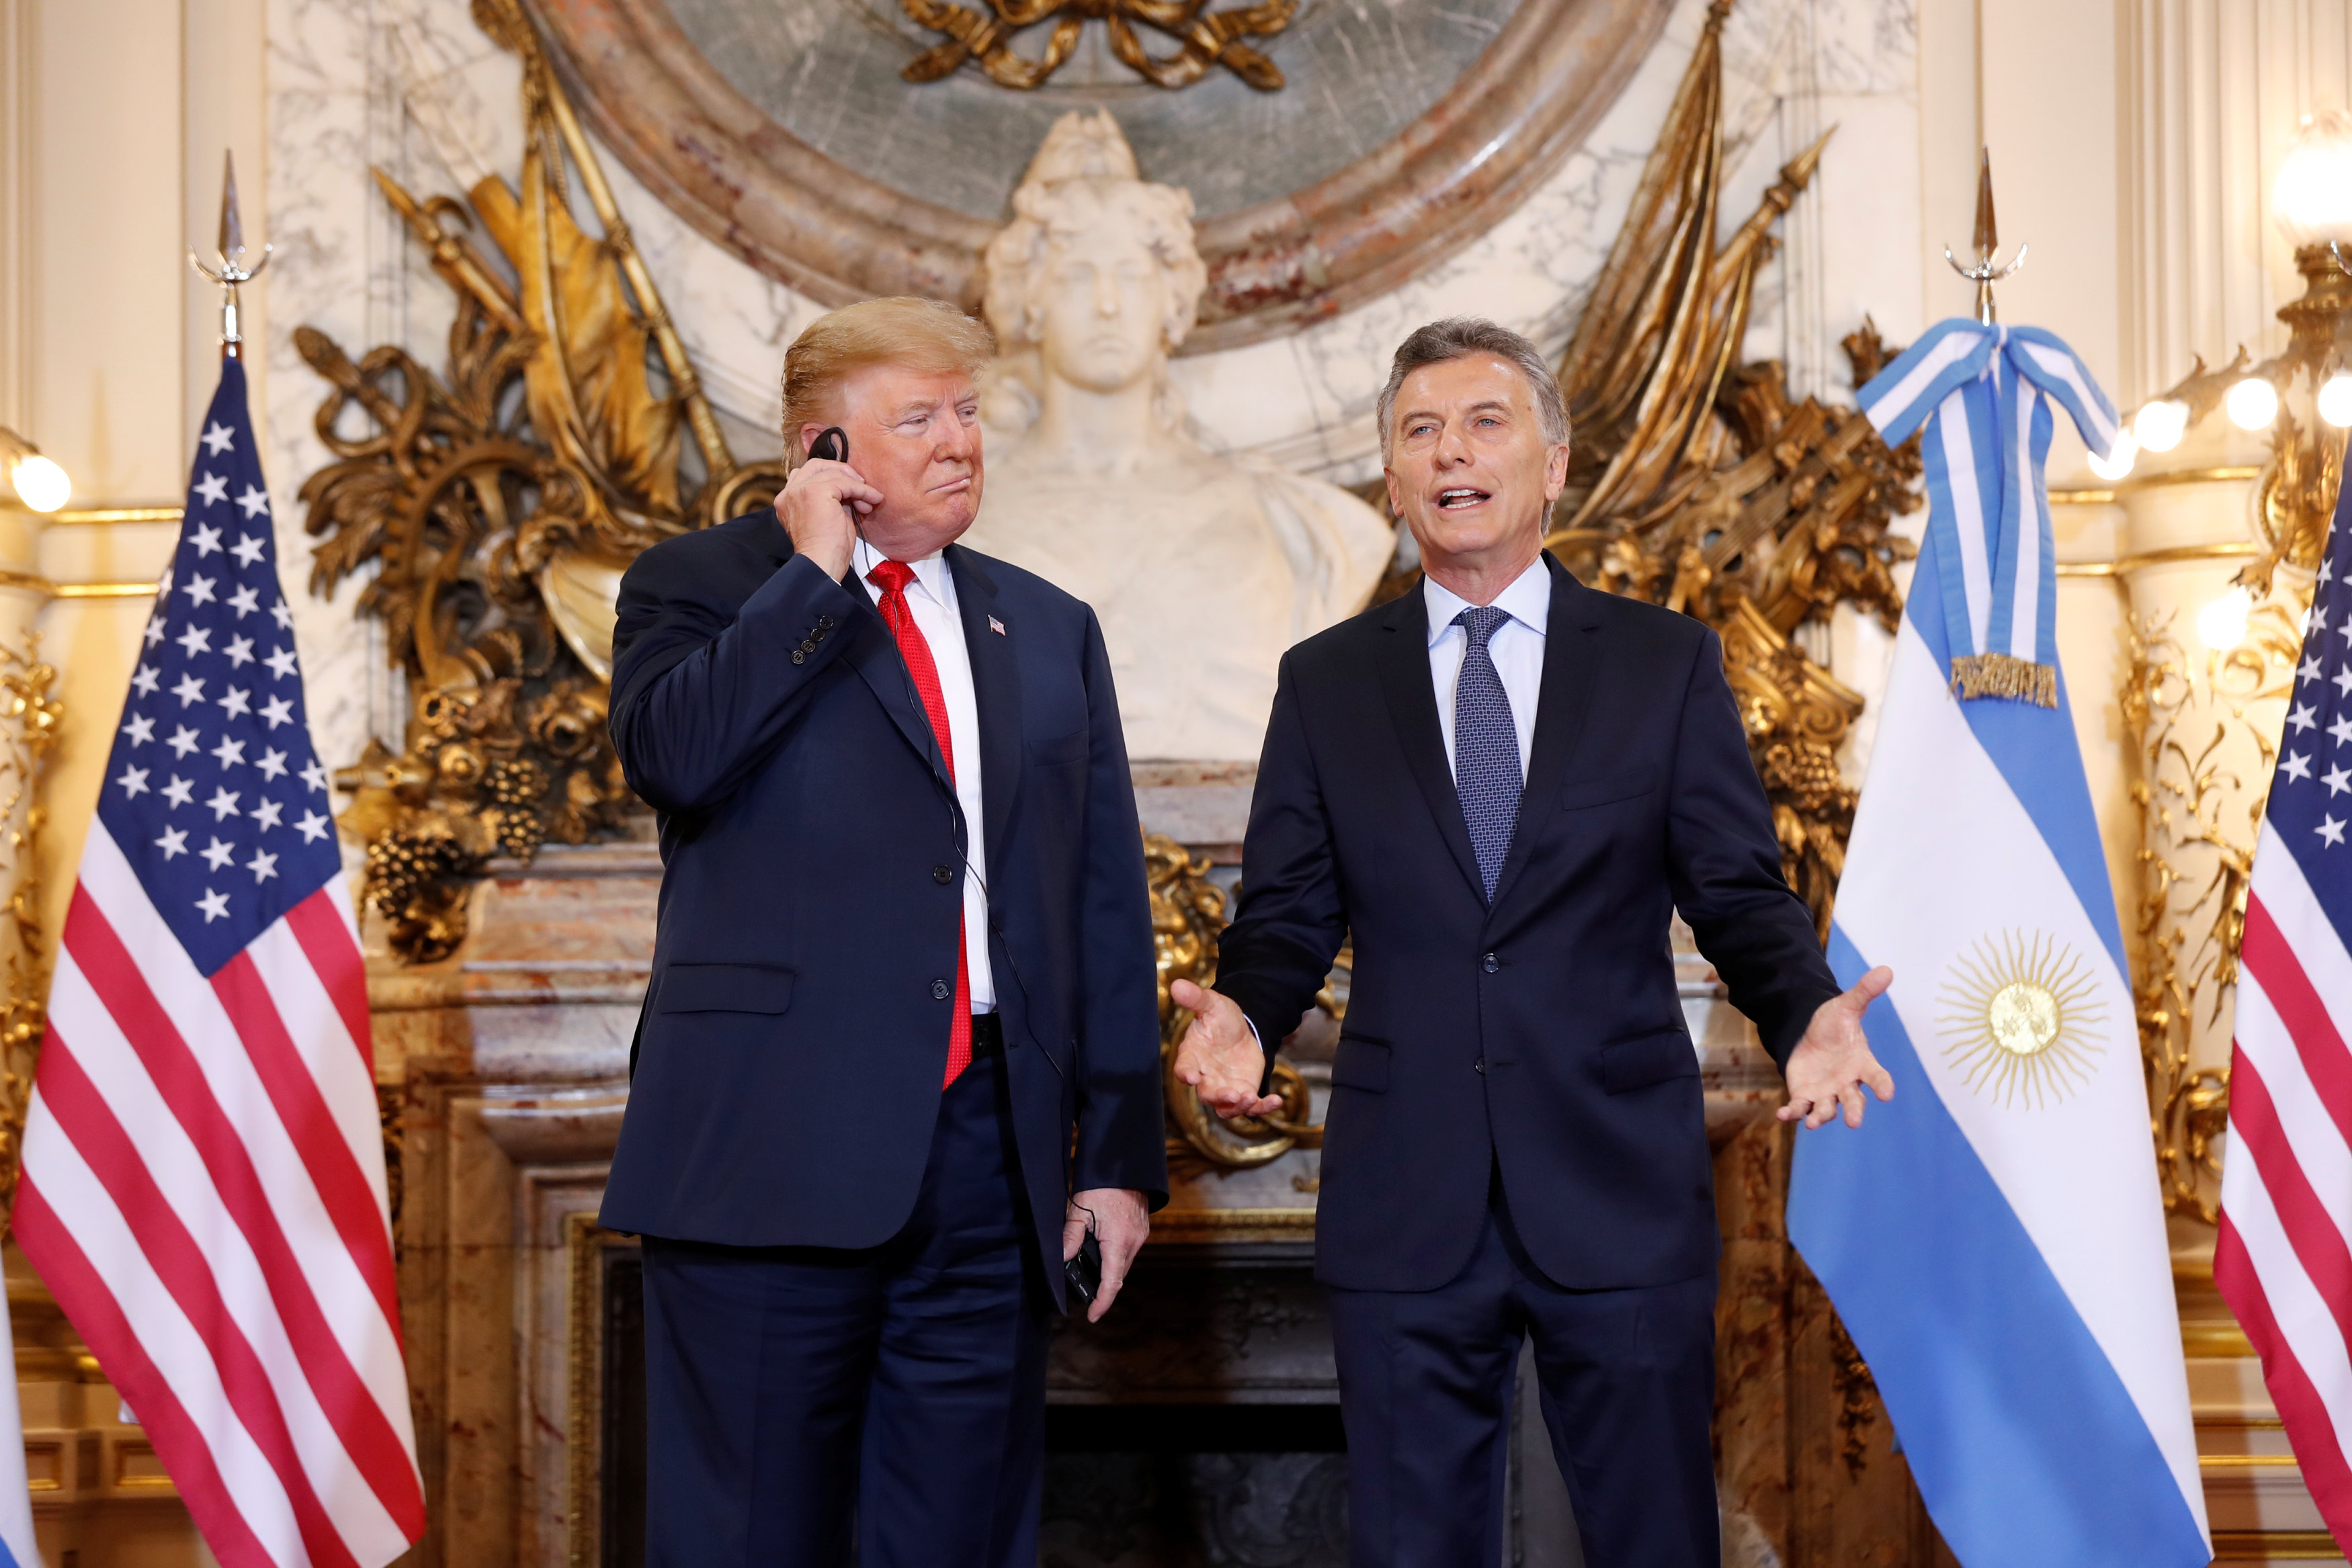 ترامب يلغي اجتماع بوتن ويتبادل عبارات مجاملة مع بن سلمان